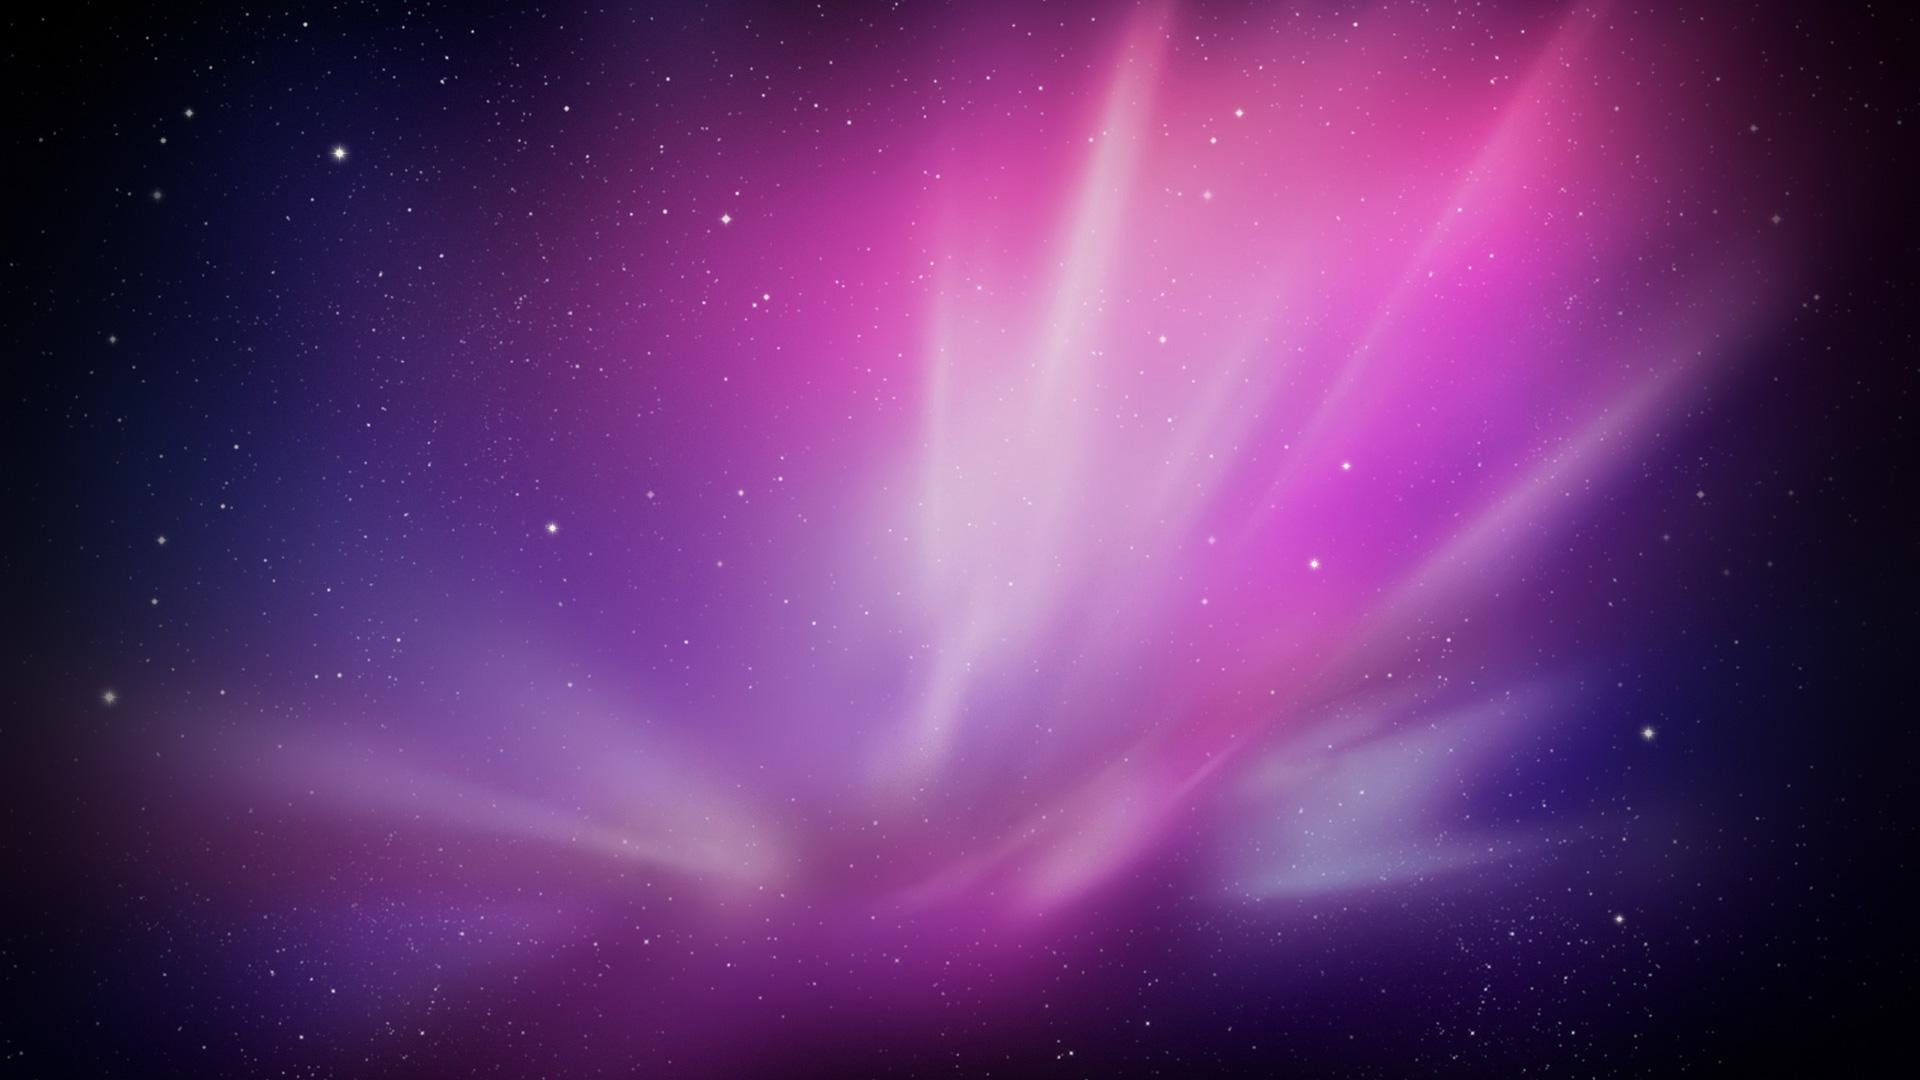 1080p Full HD Wallpapers download 1080p desktop backgrounds   Part 1920x1080